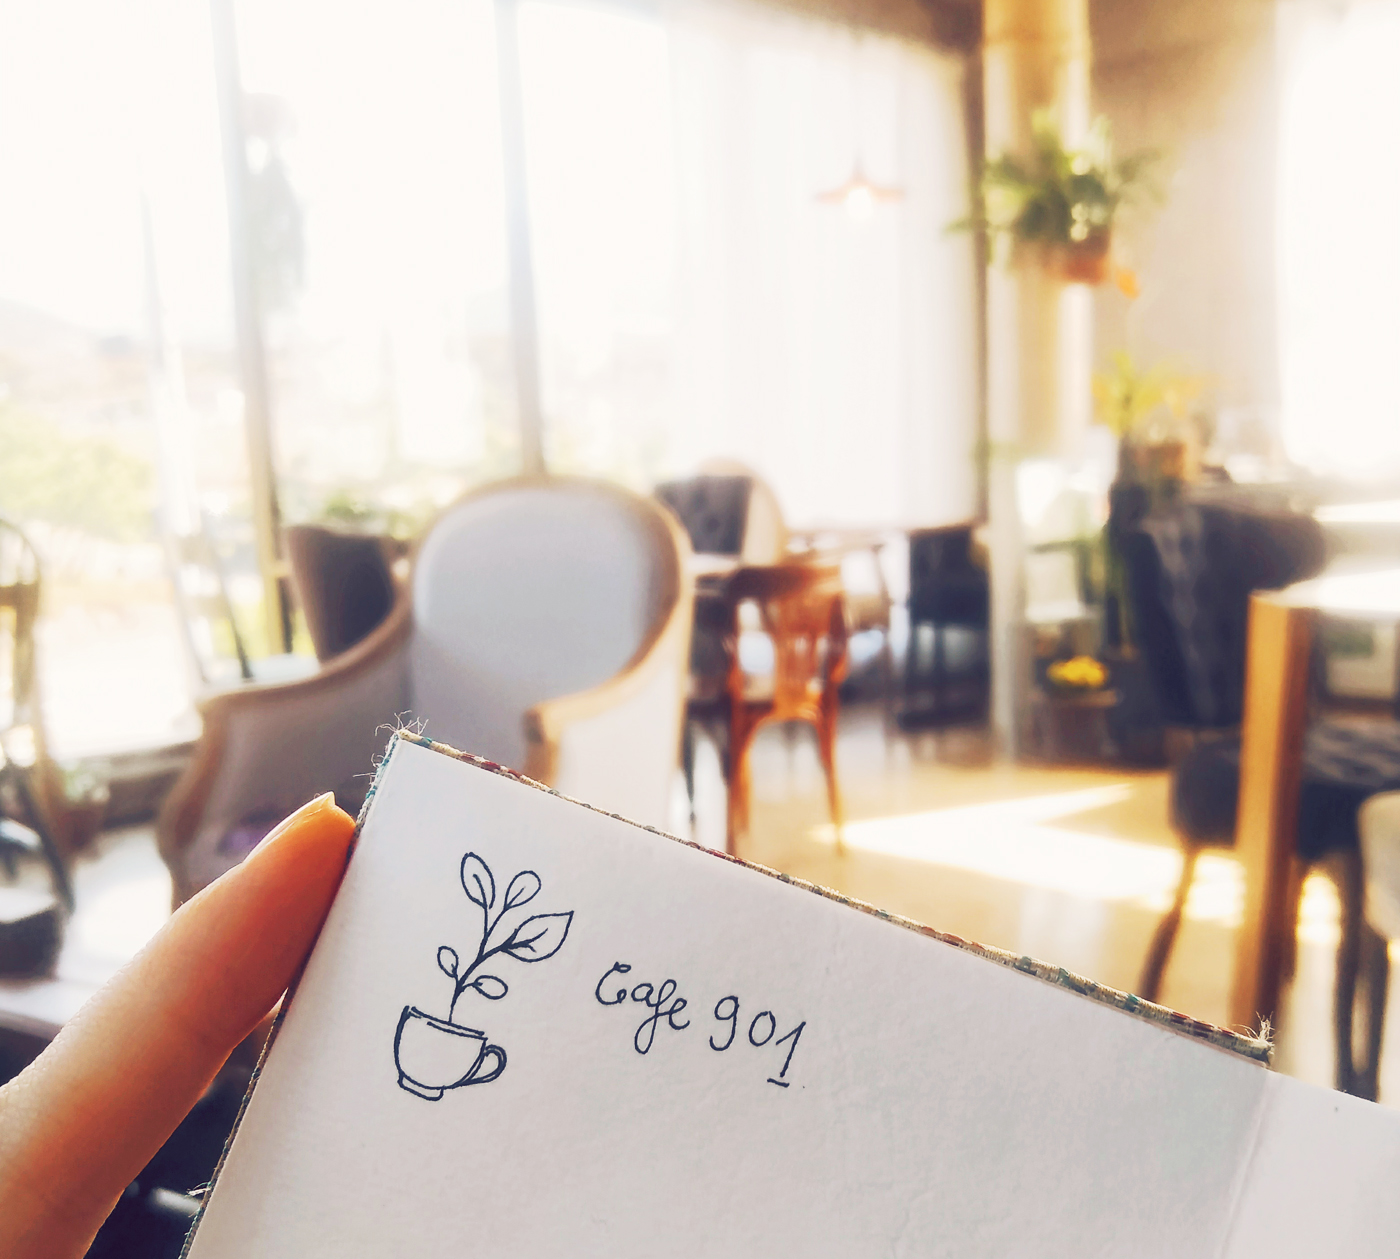 cafe901-restaurant-vegan-korea-jeju =.jpg